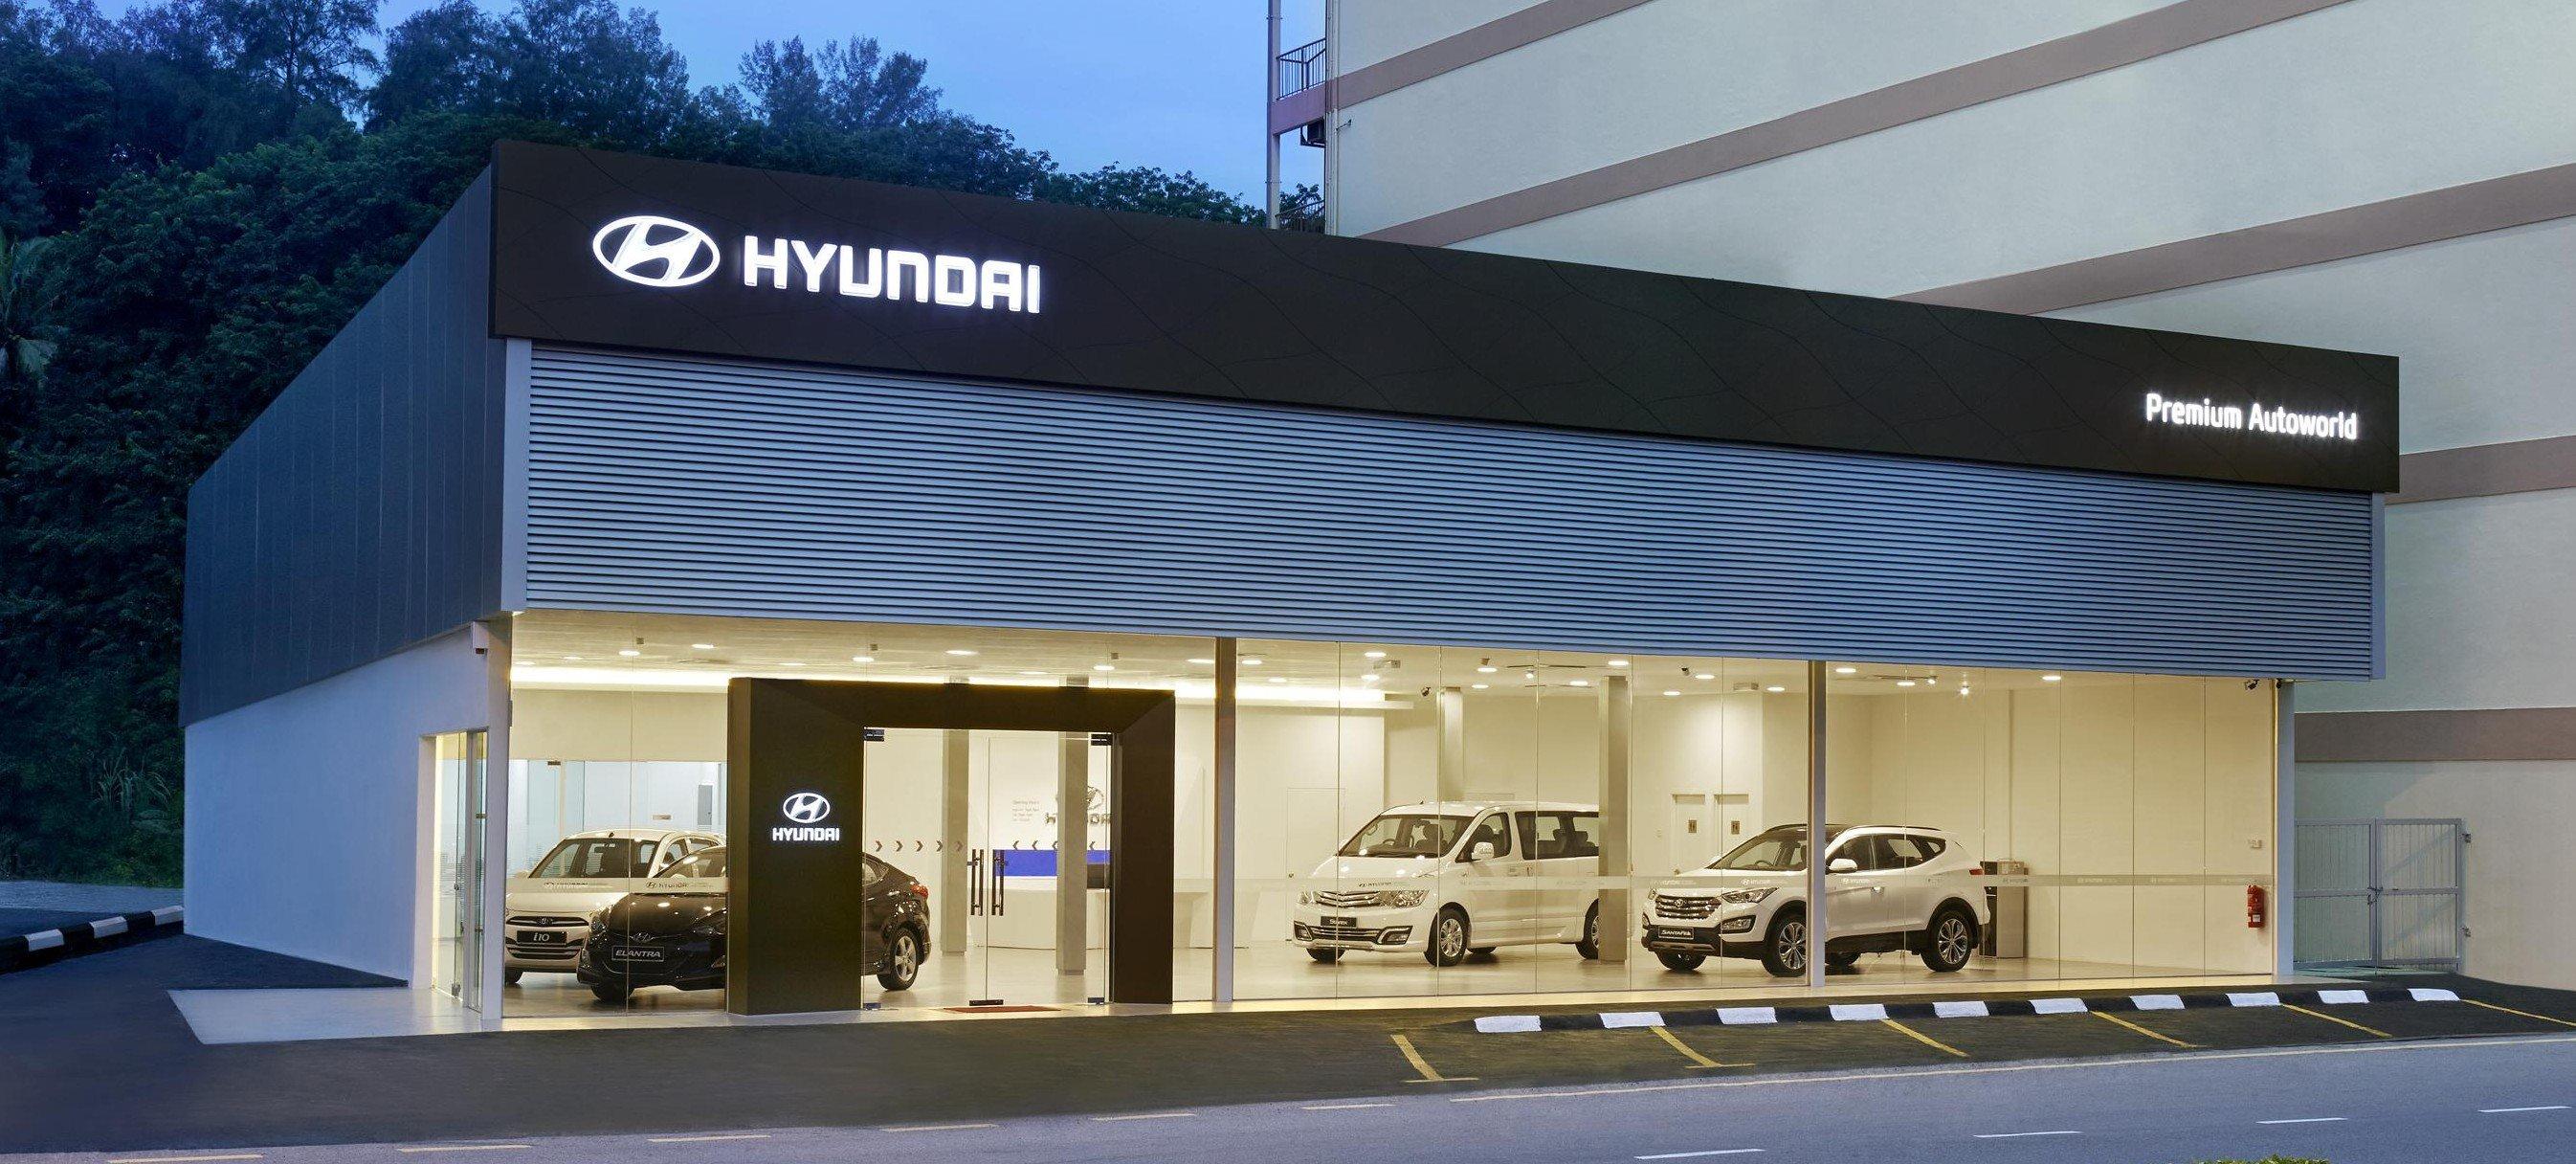 Hyundai malaysia sports revamped global dealership design for Modern showroom exterior design